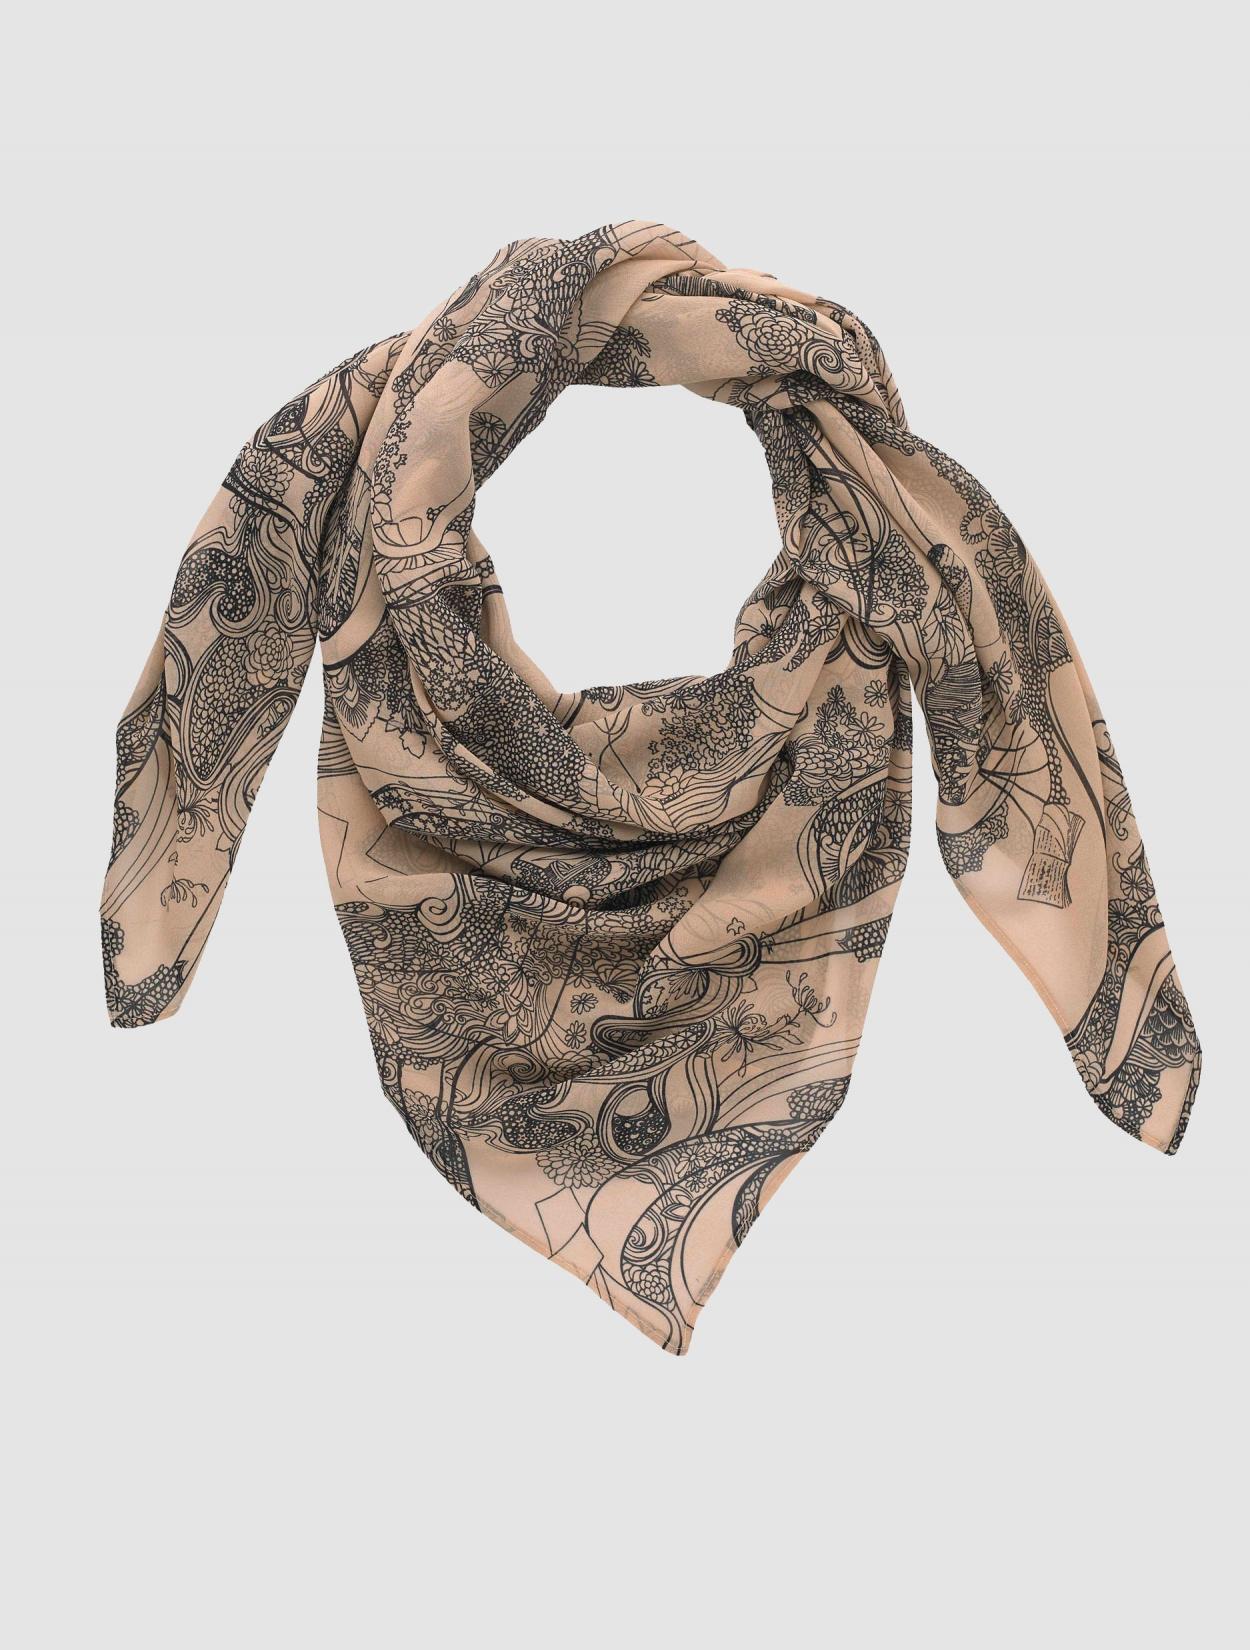 scarf2_GREY_1250_1650_s_c1.jpg